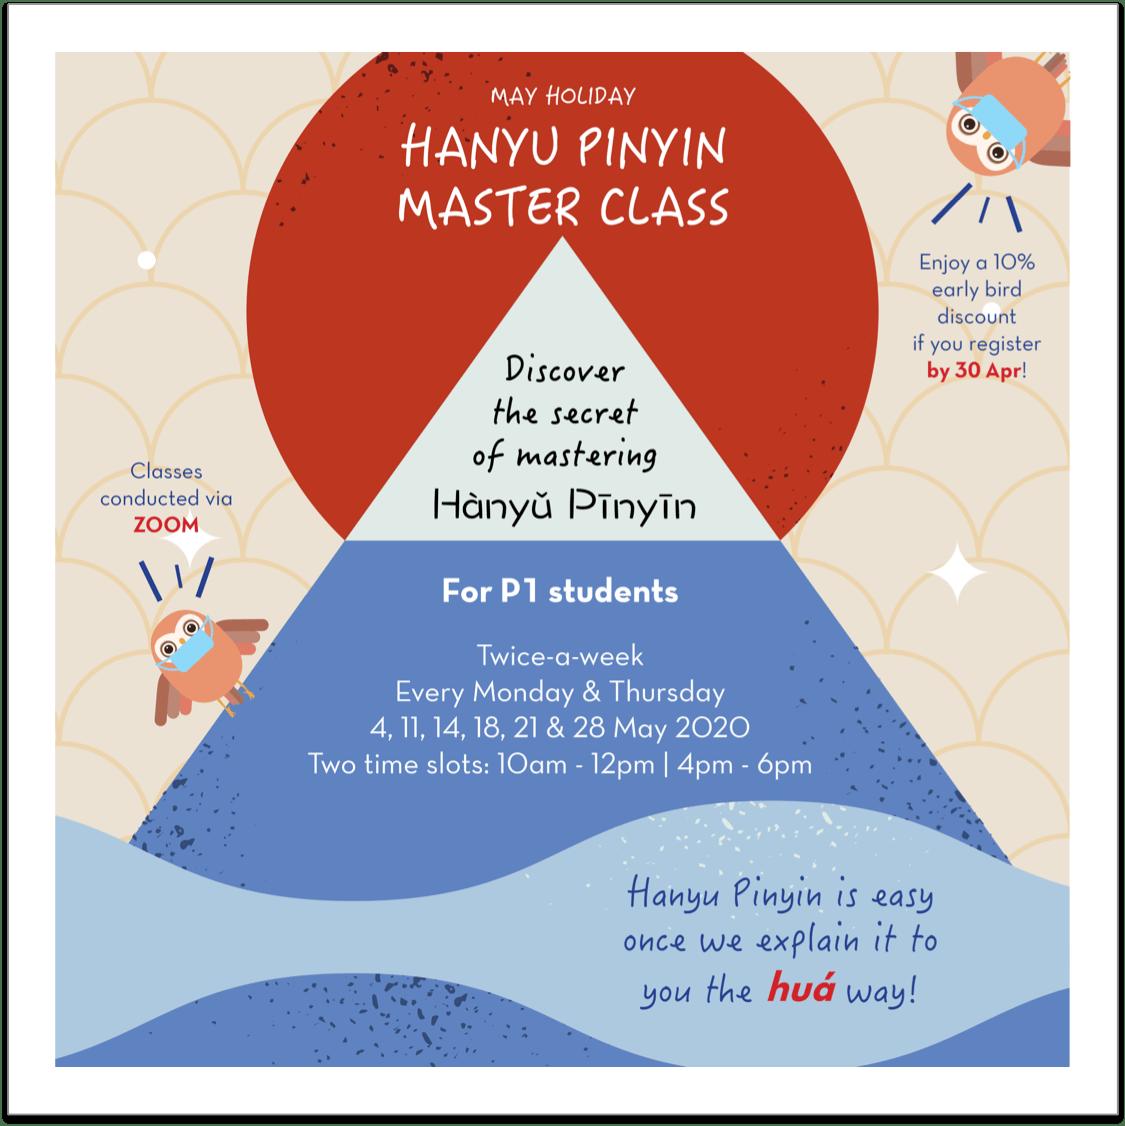 May 2020 Hanyu Pinyin Master Class (ZOOM Edition)